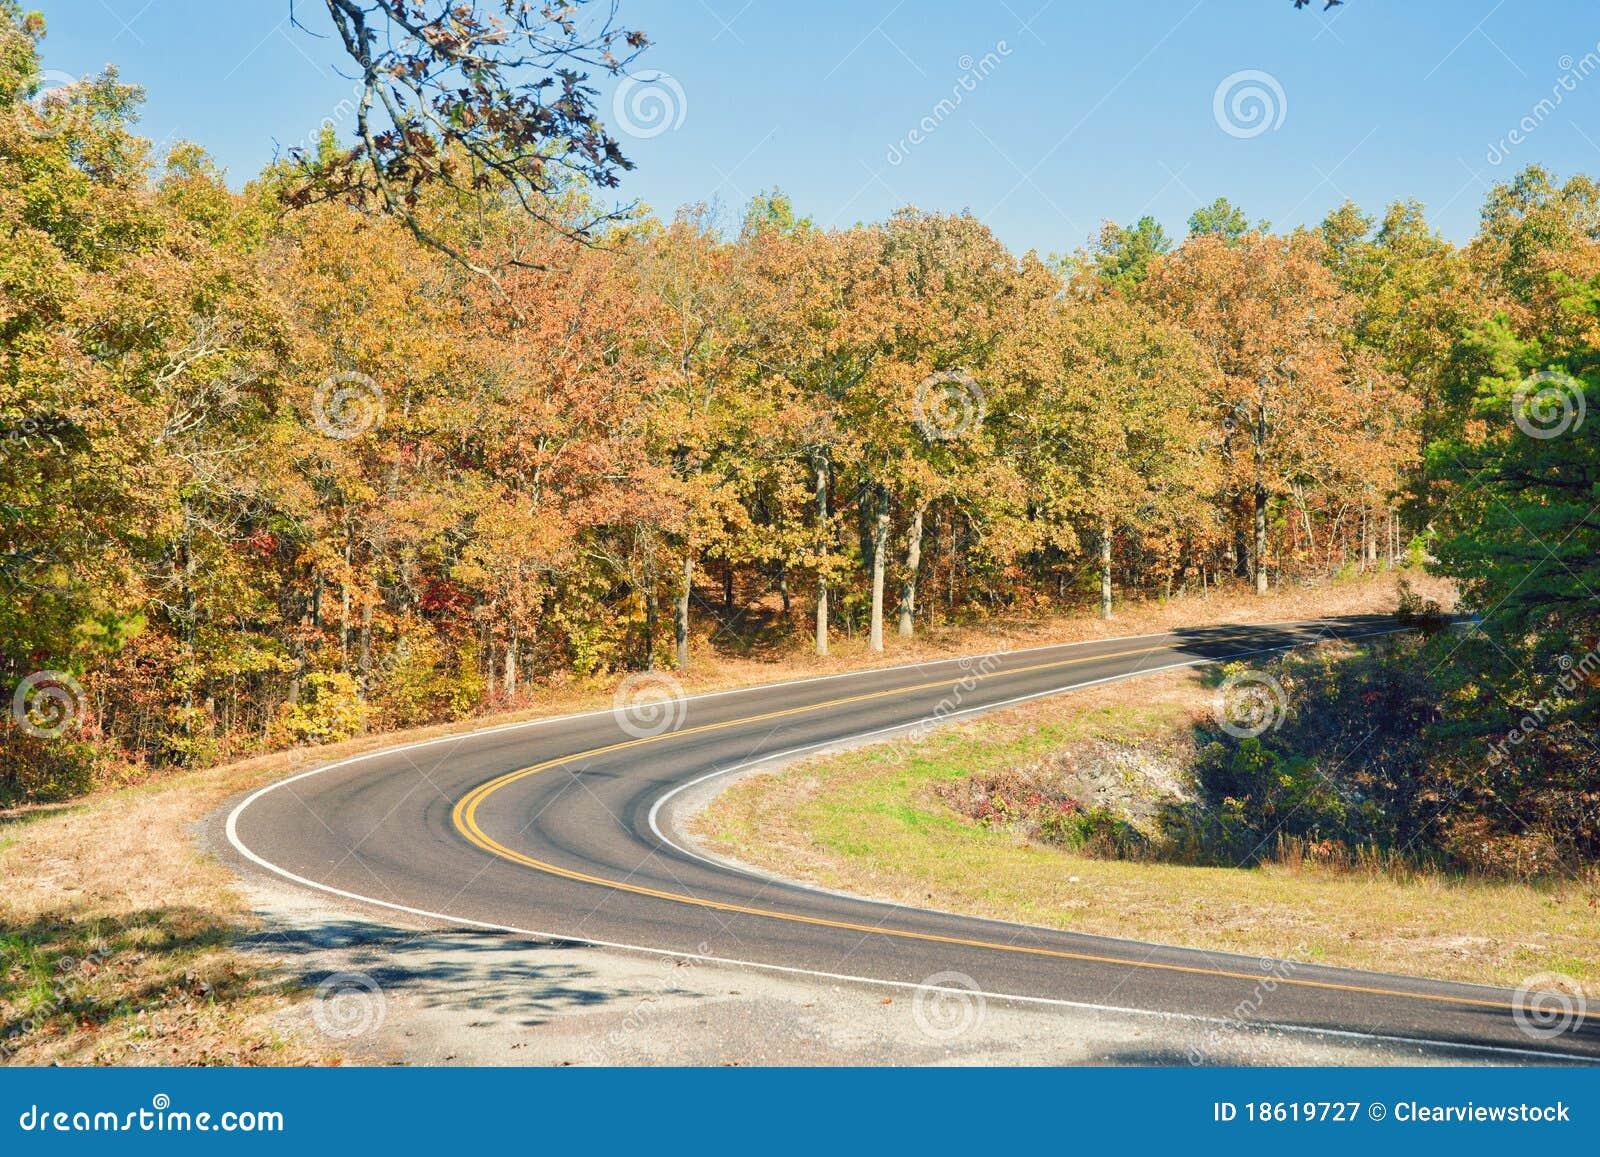 Carretera del otoño o de la caída